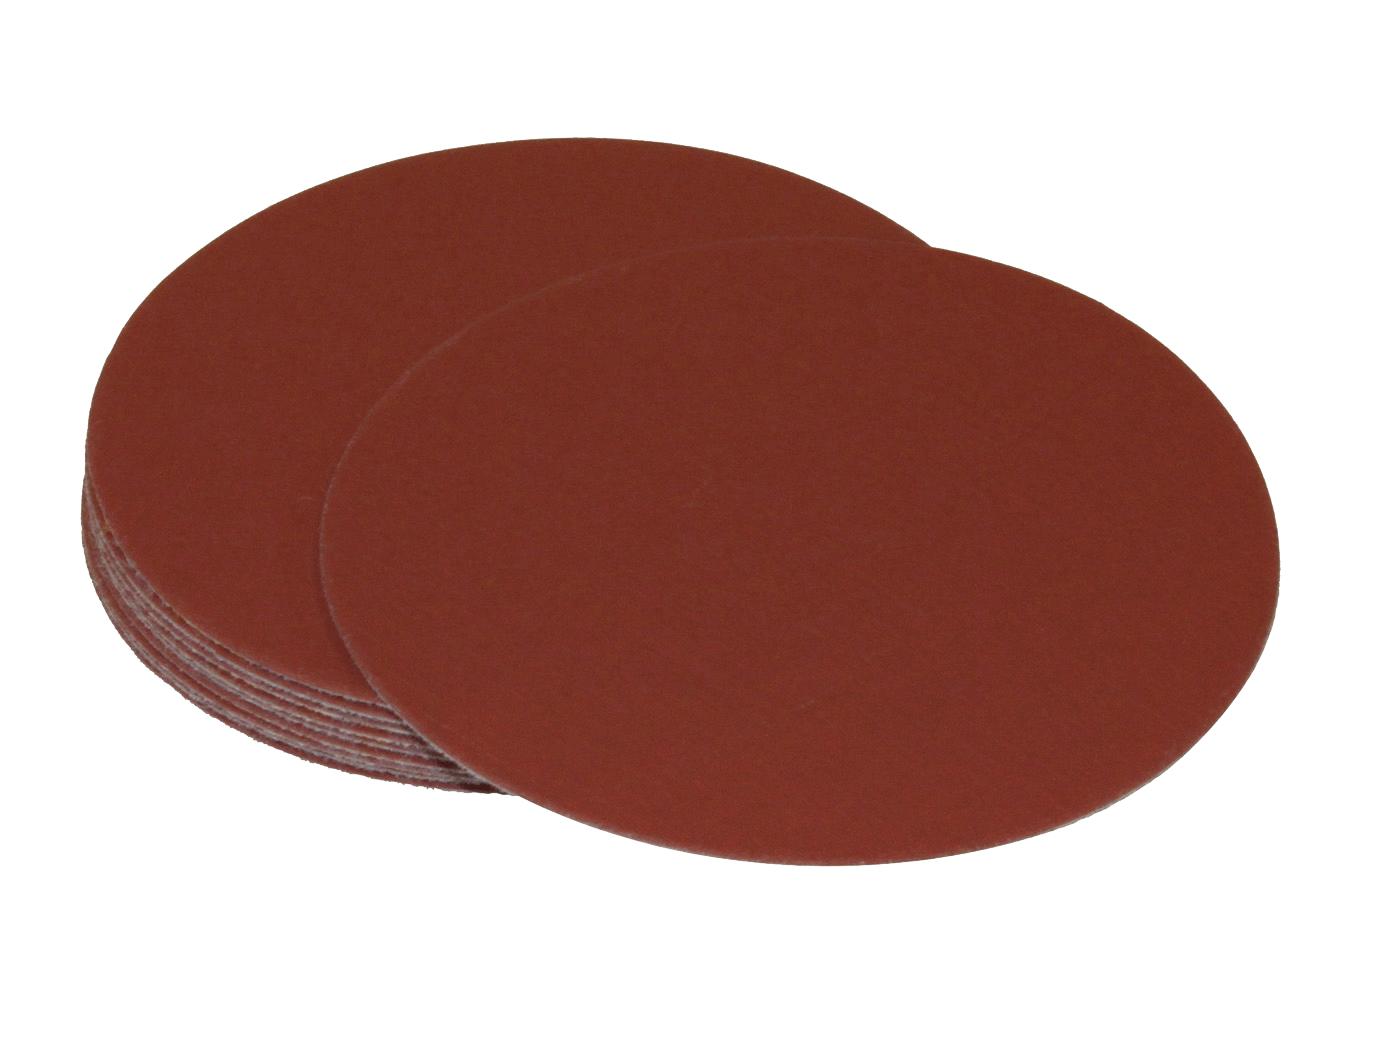 180 Grit Sanding Discs (PKG of 10)